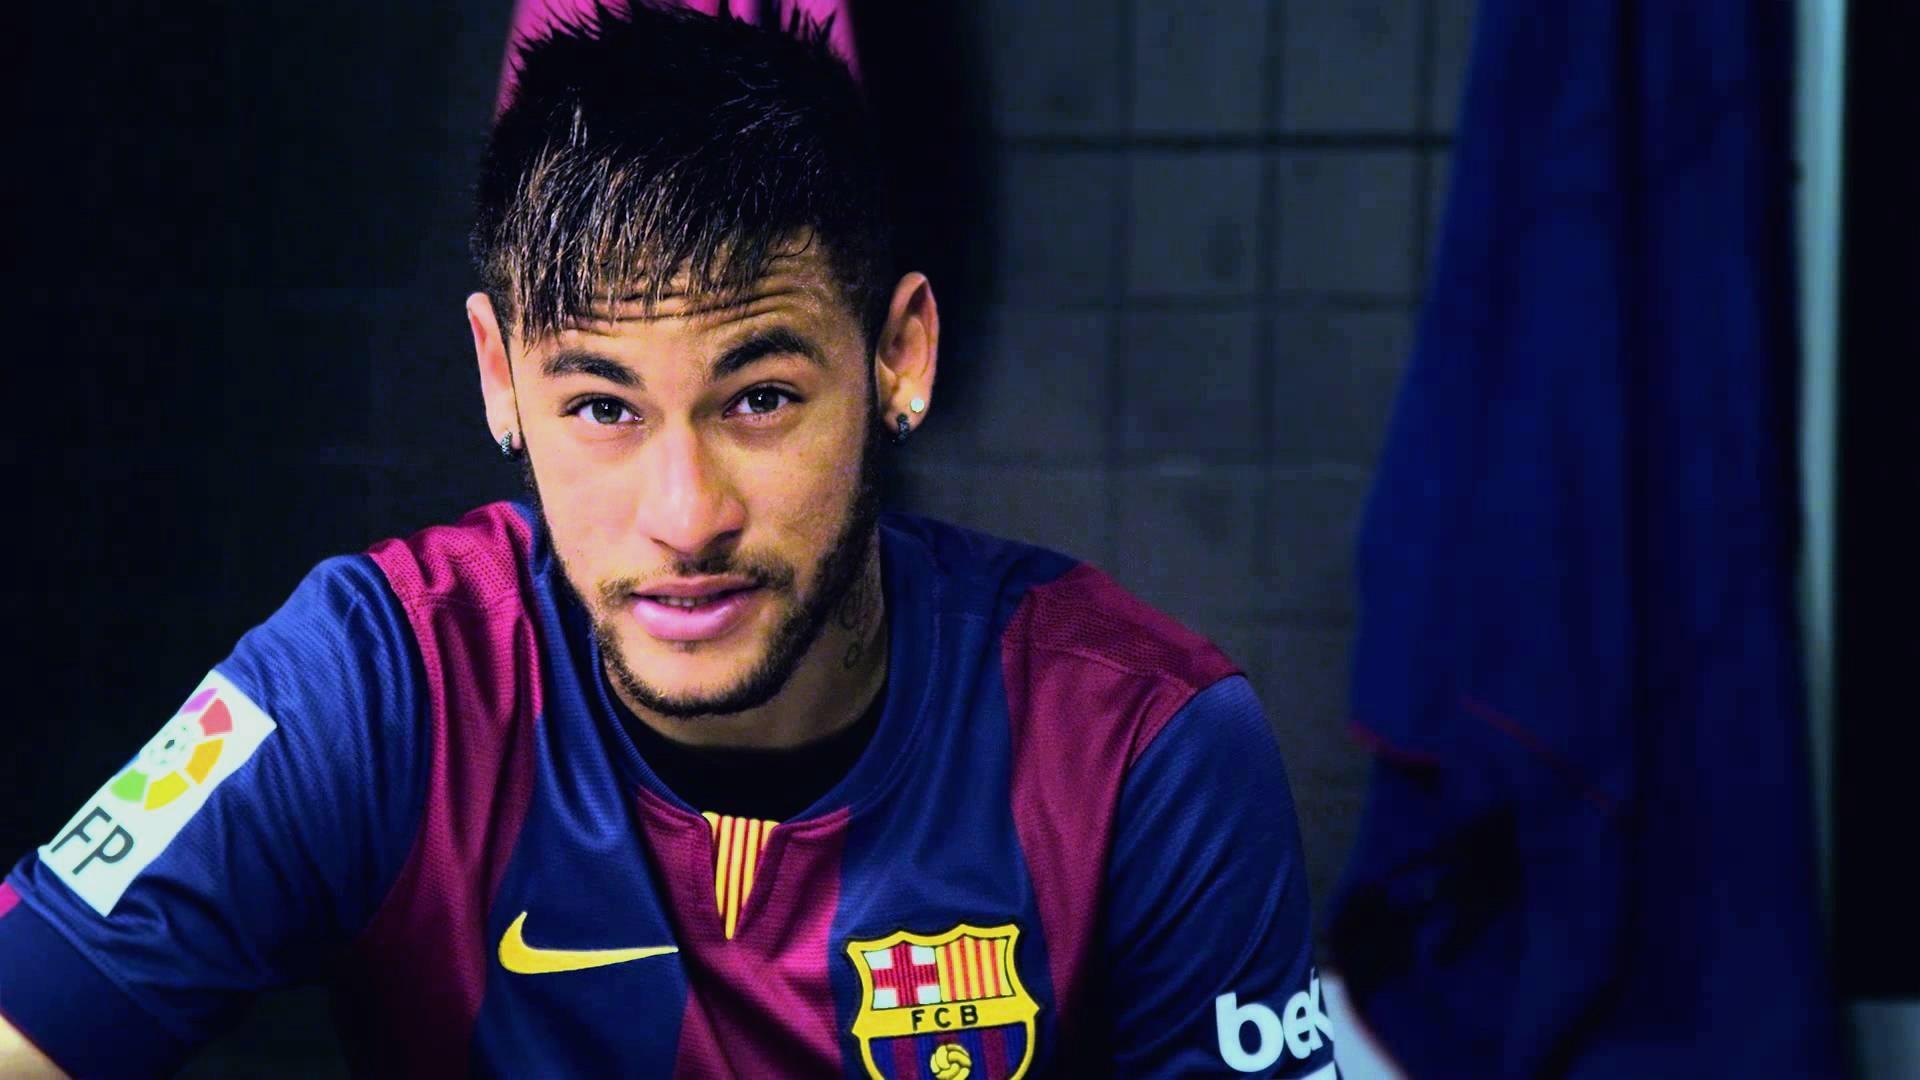 Neymar membuat debutnya bersama selecao pada 2010. Neymar Wallpapers, Cool Neymar Footballer, #28784